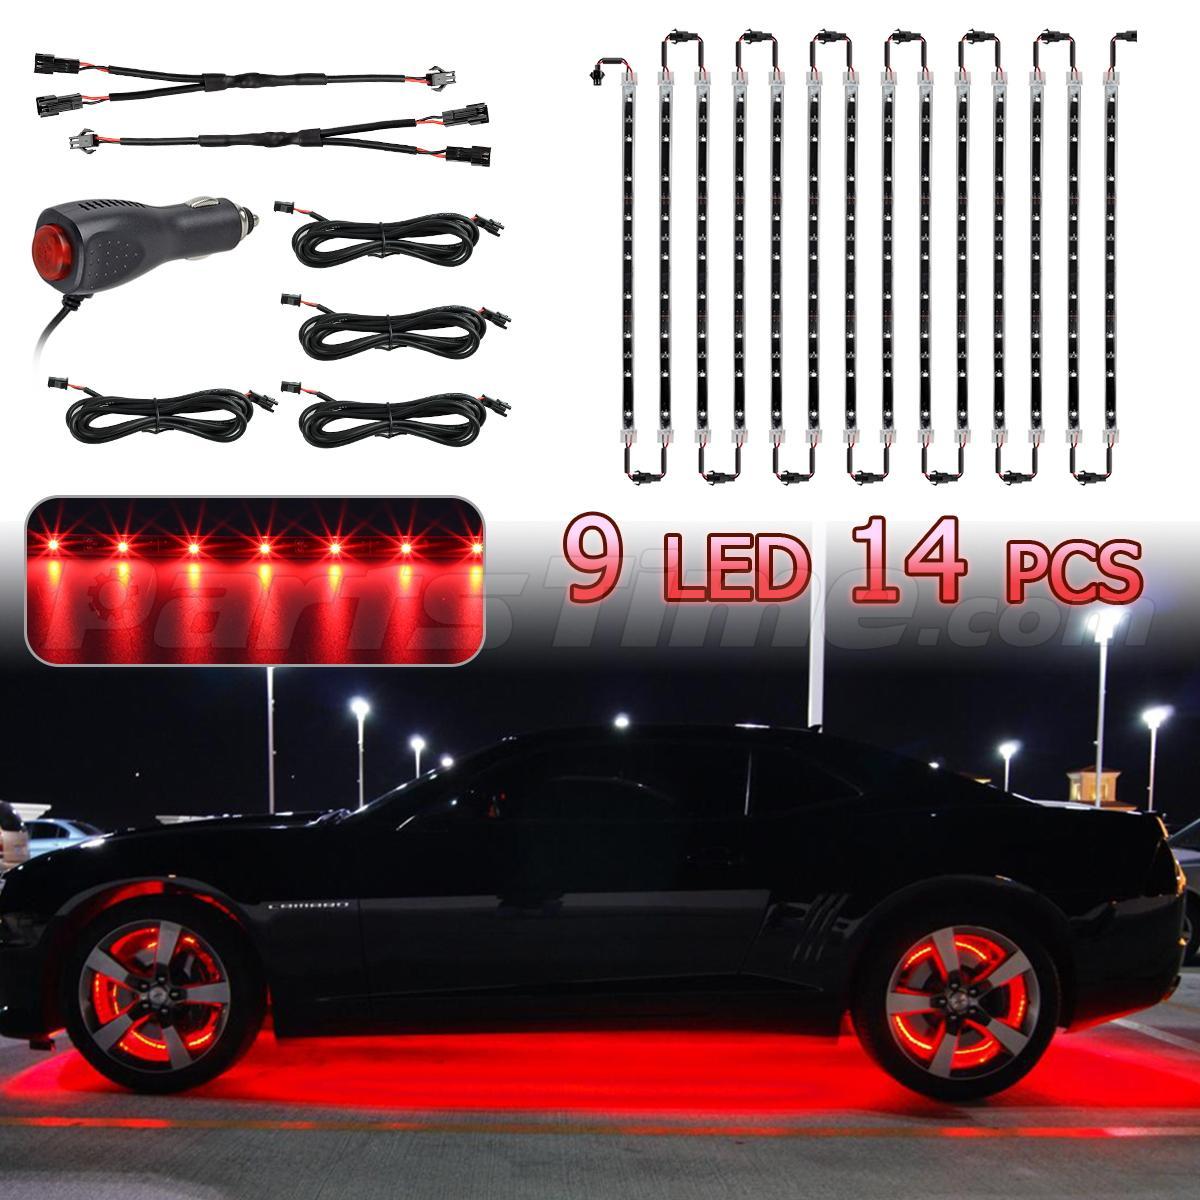 Set 14 Tubes Red Car Underbody Under Glow LED Light Strip 9 3528 SMD  Lighting